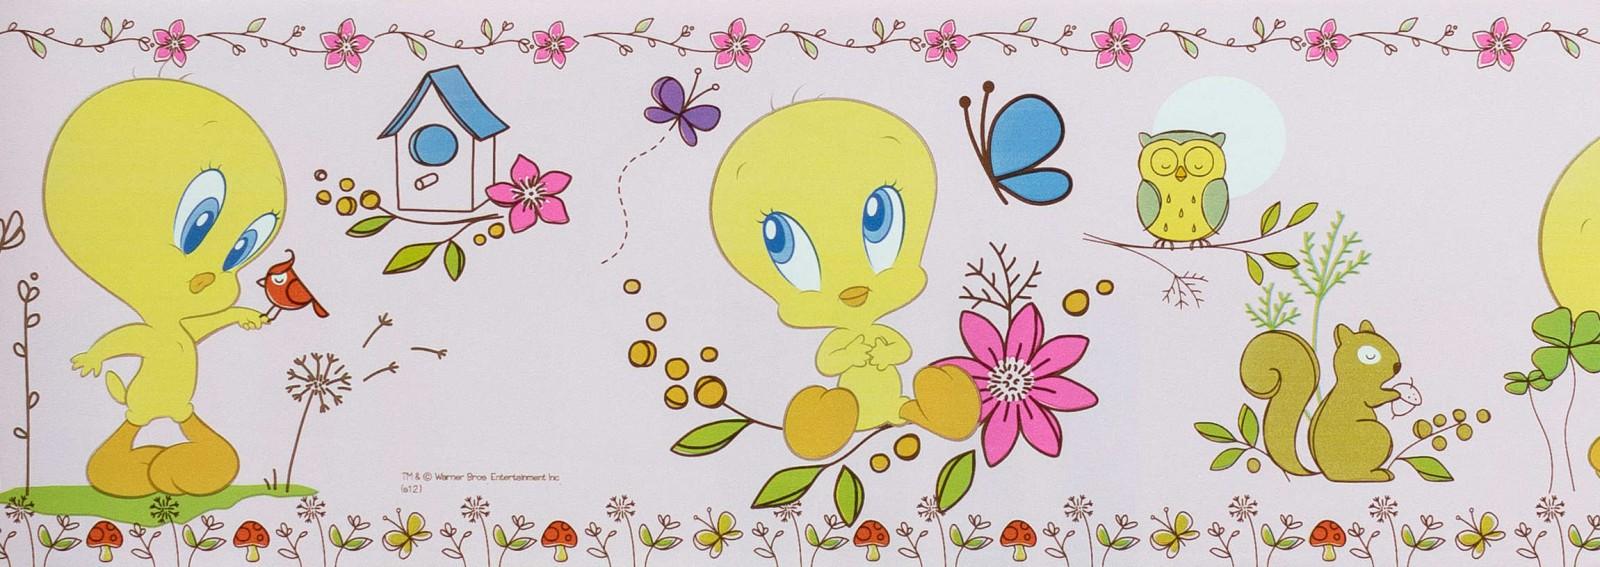 Baby looney tunes wallpaper border - photo#14